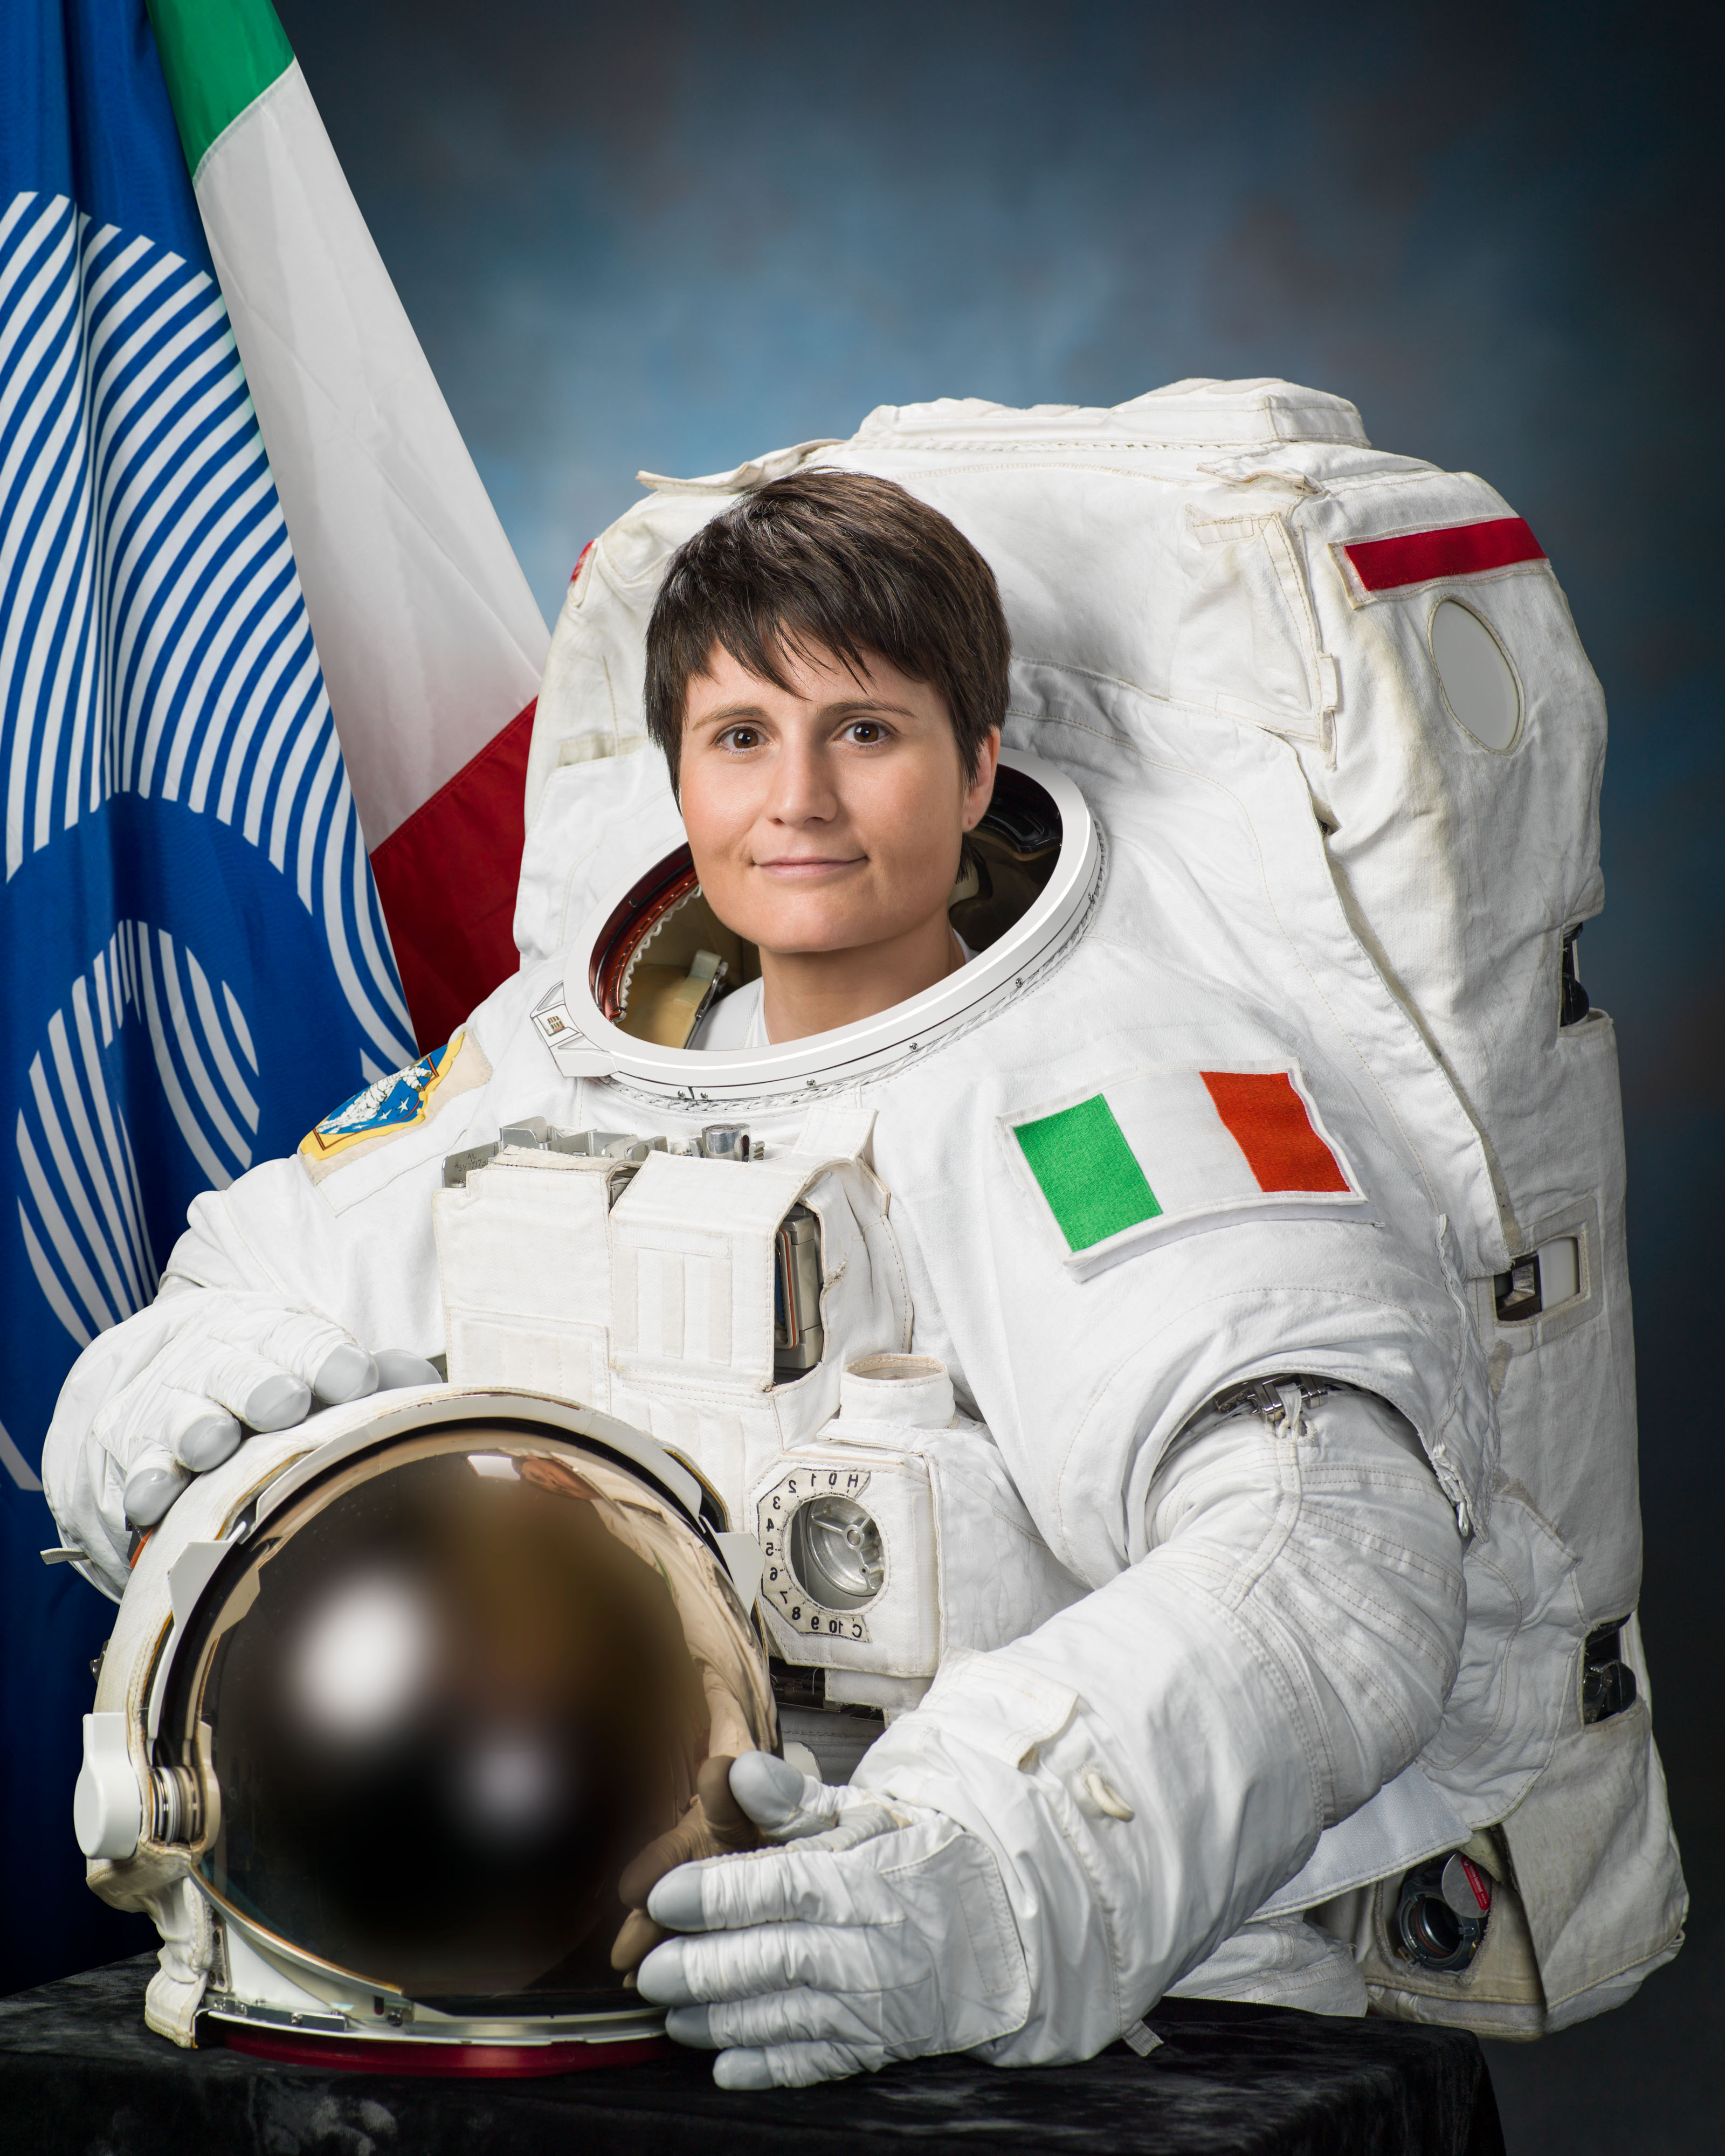 astronaut dating site)